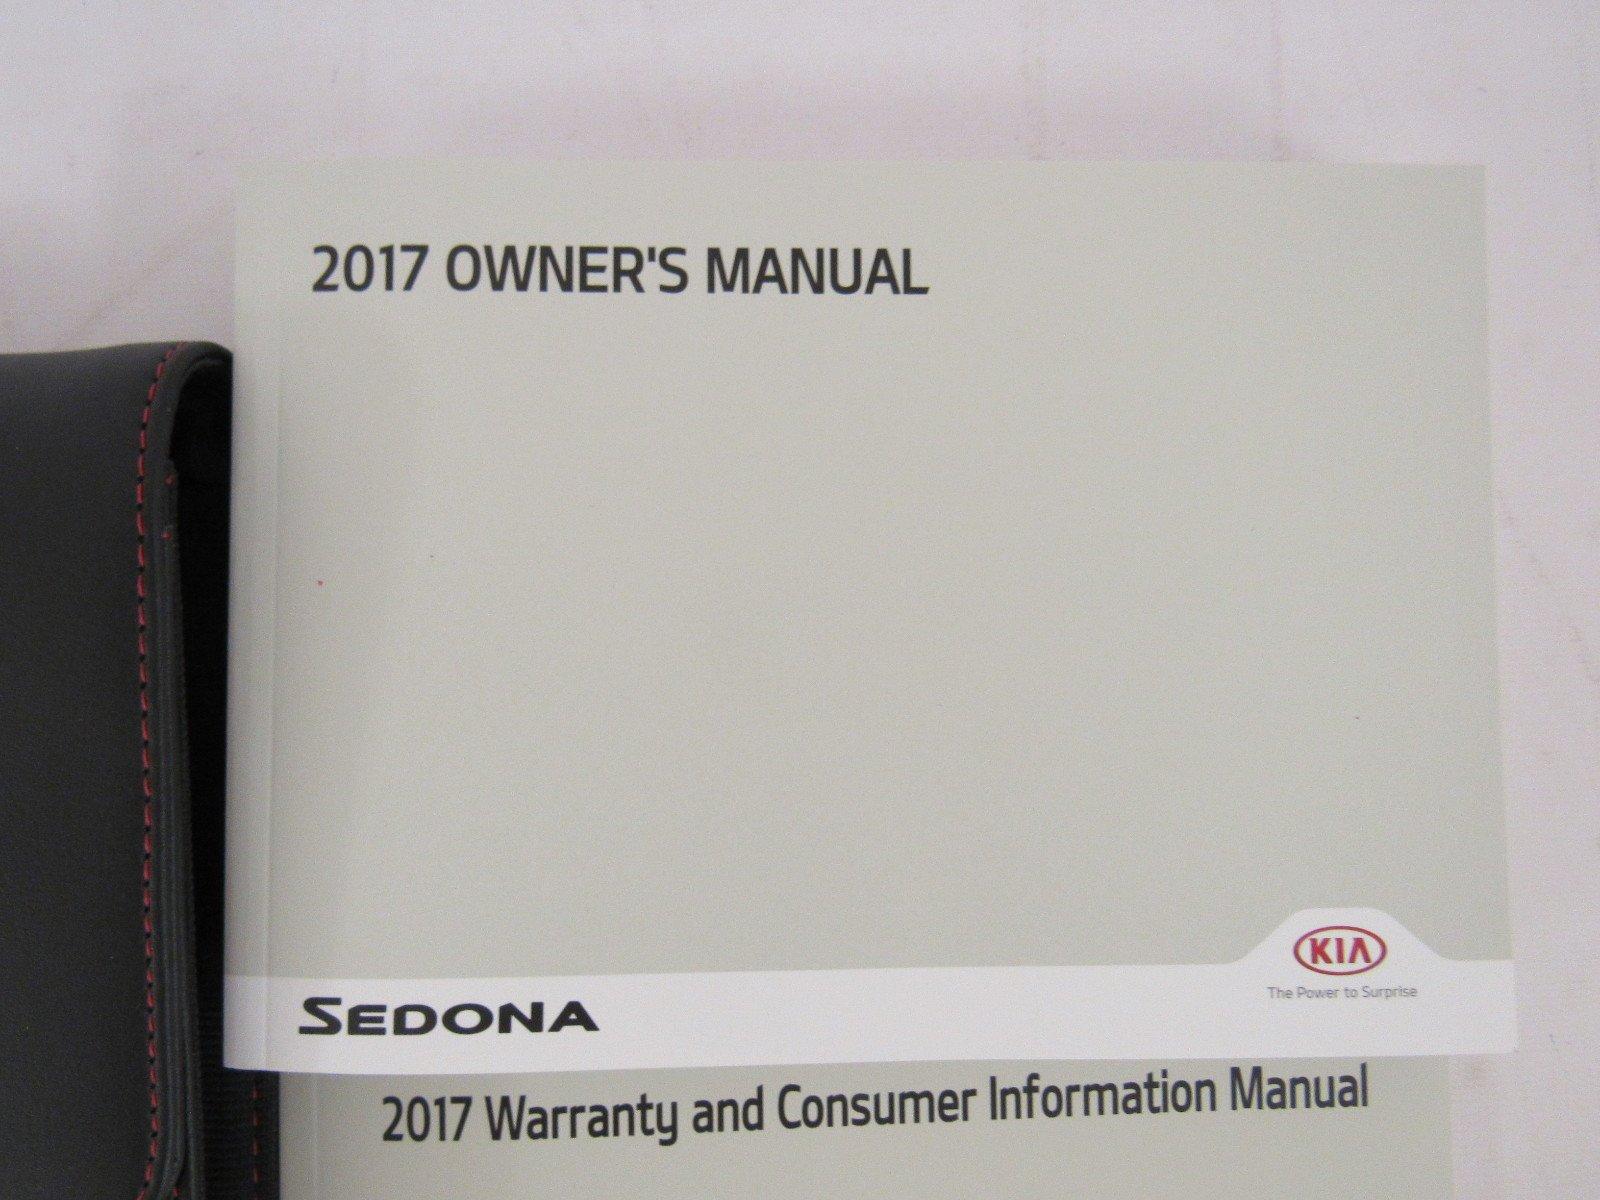 2017 kia sedona owners manual guide book kia amazon com books rh amazon com kia sedona owners manual 2016 kia sedona owners manual 2015